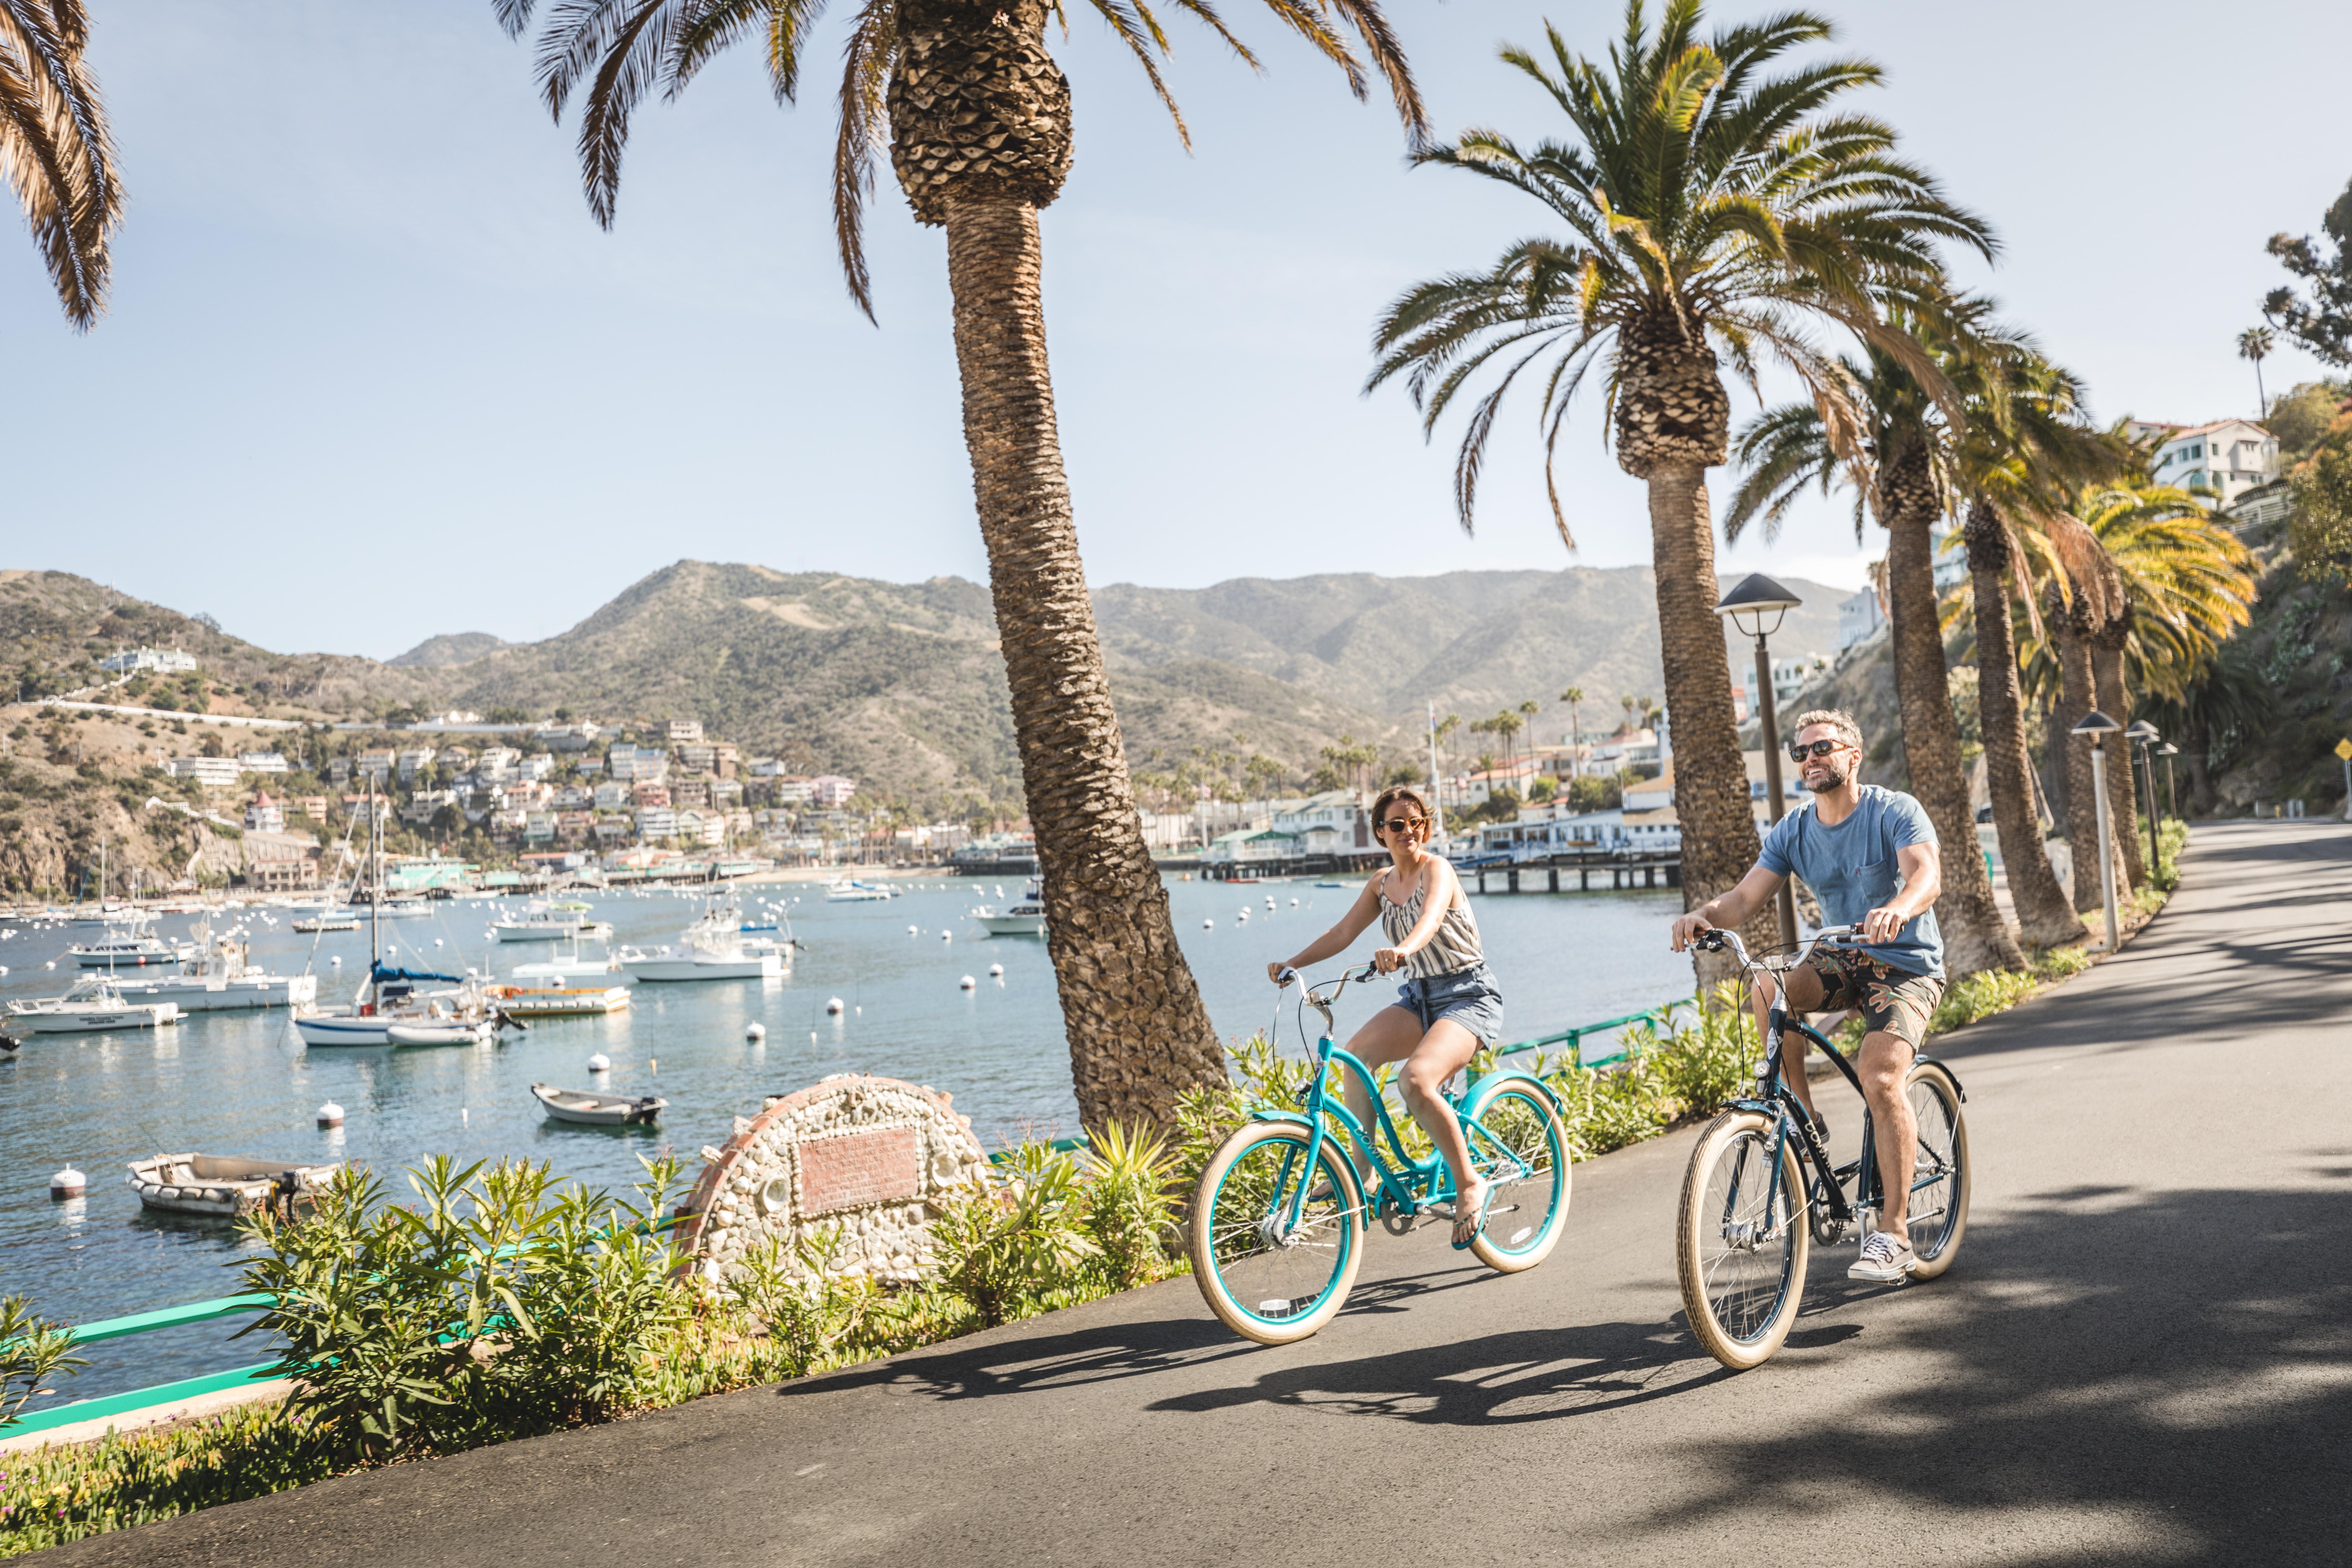 Catalina Island Hotels and Accommodations | Catalina Island